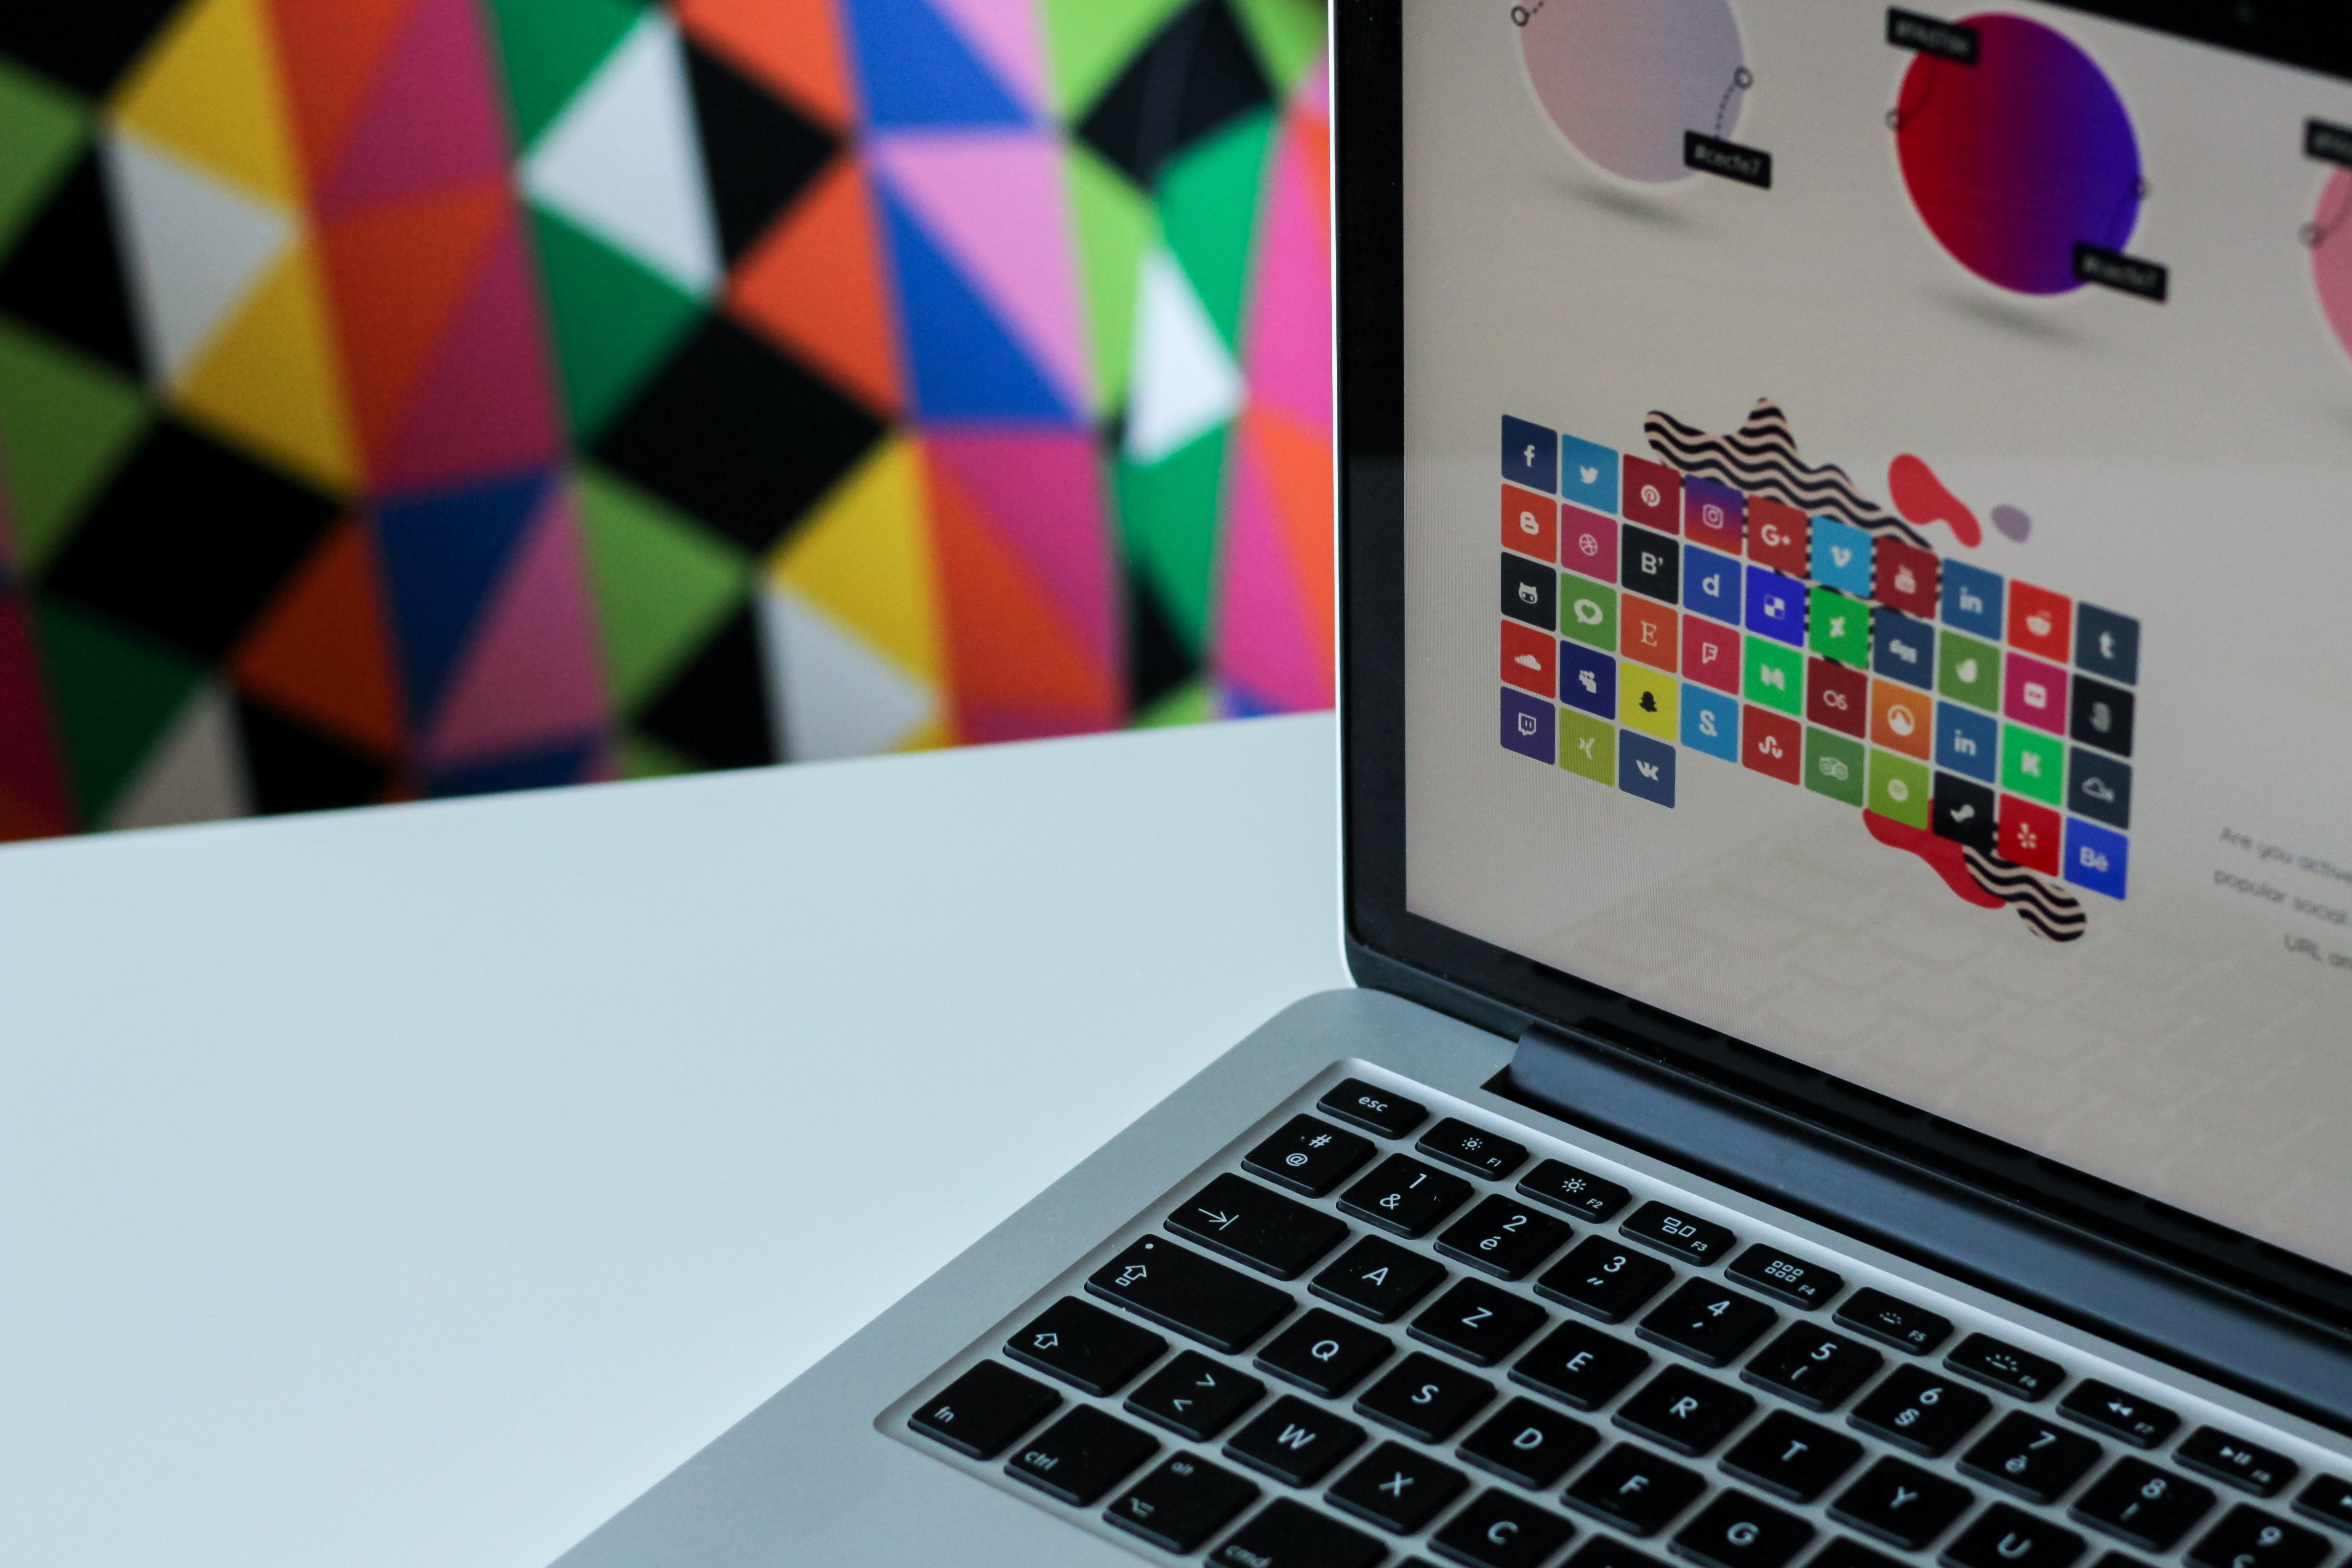 Adobe Photoshop Advanced Workshop, New York, United States